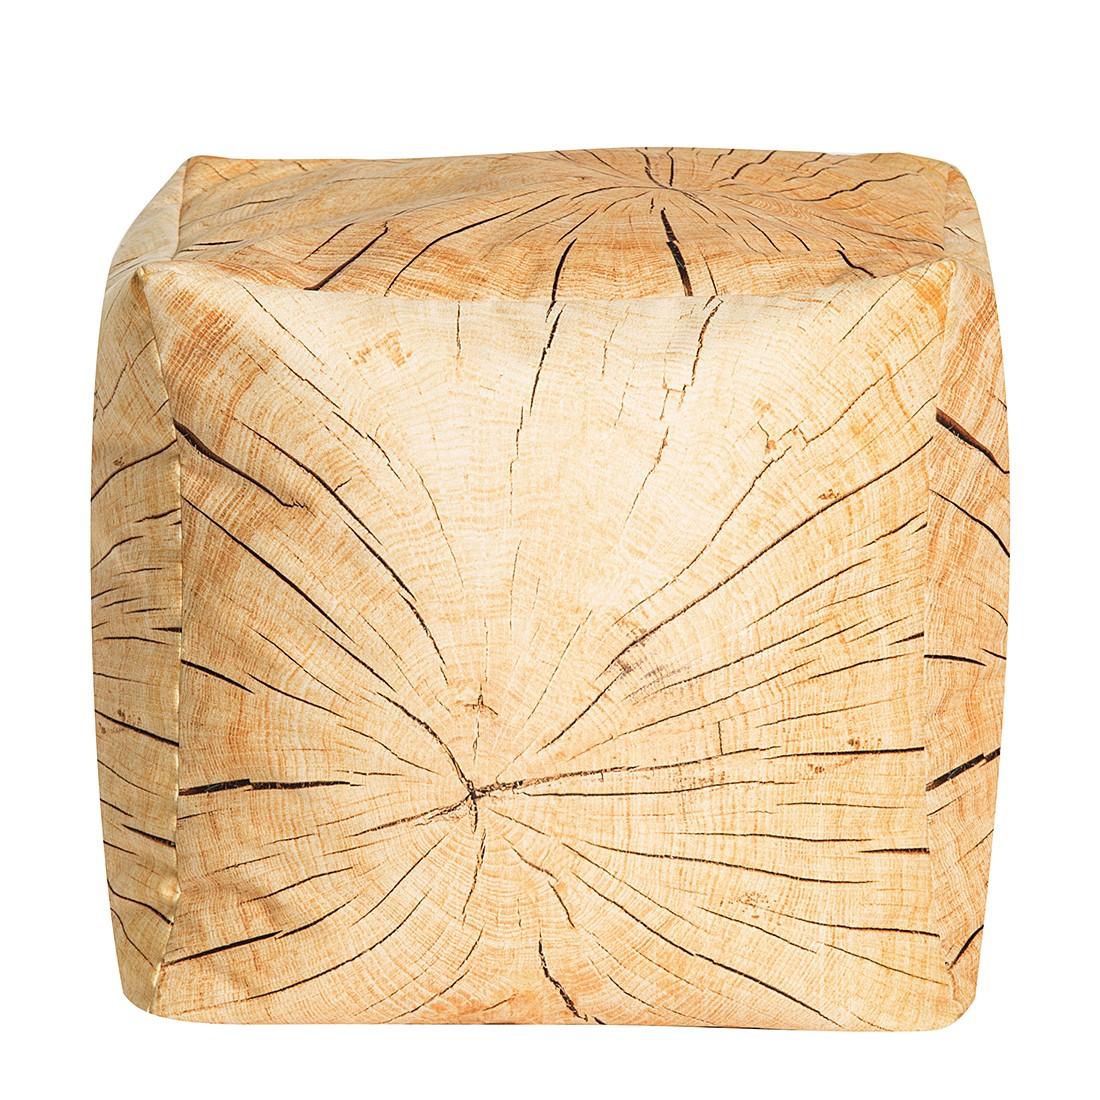 Sitzwürfel Cube Tree – Microfaser, Fredriks jetzt kaufen